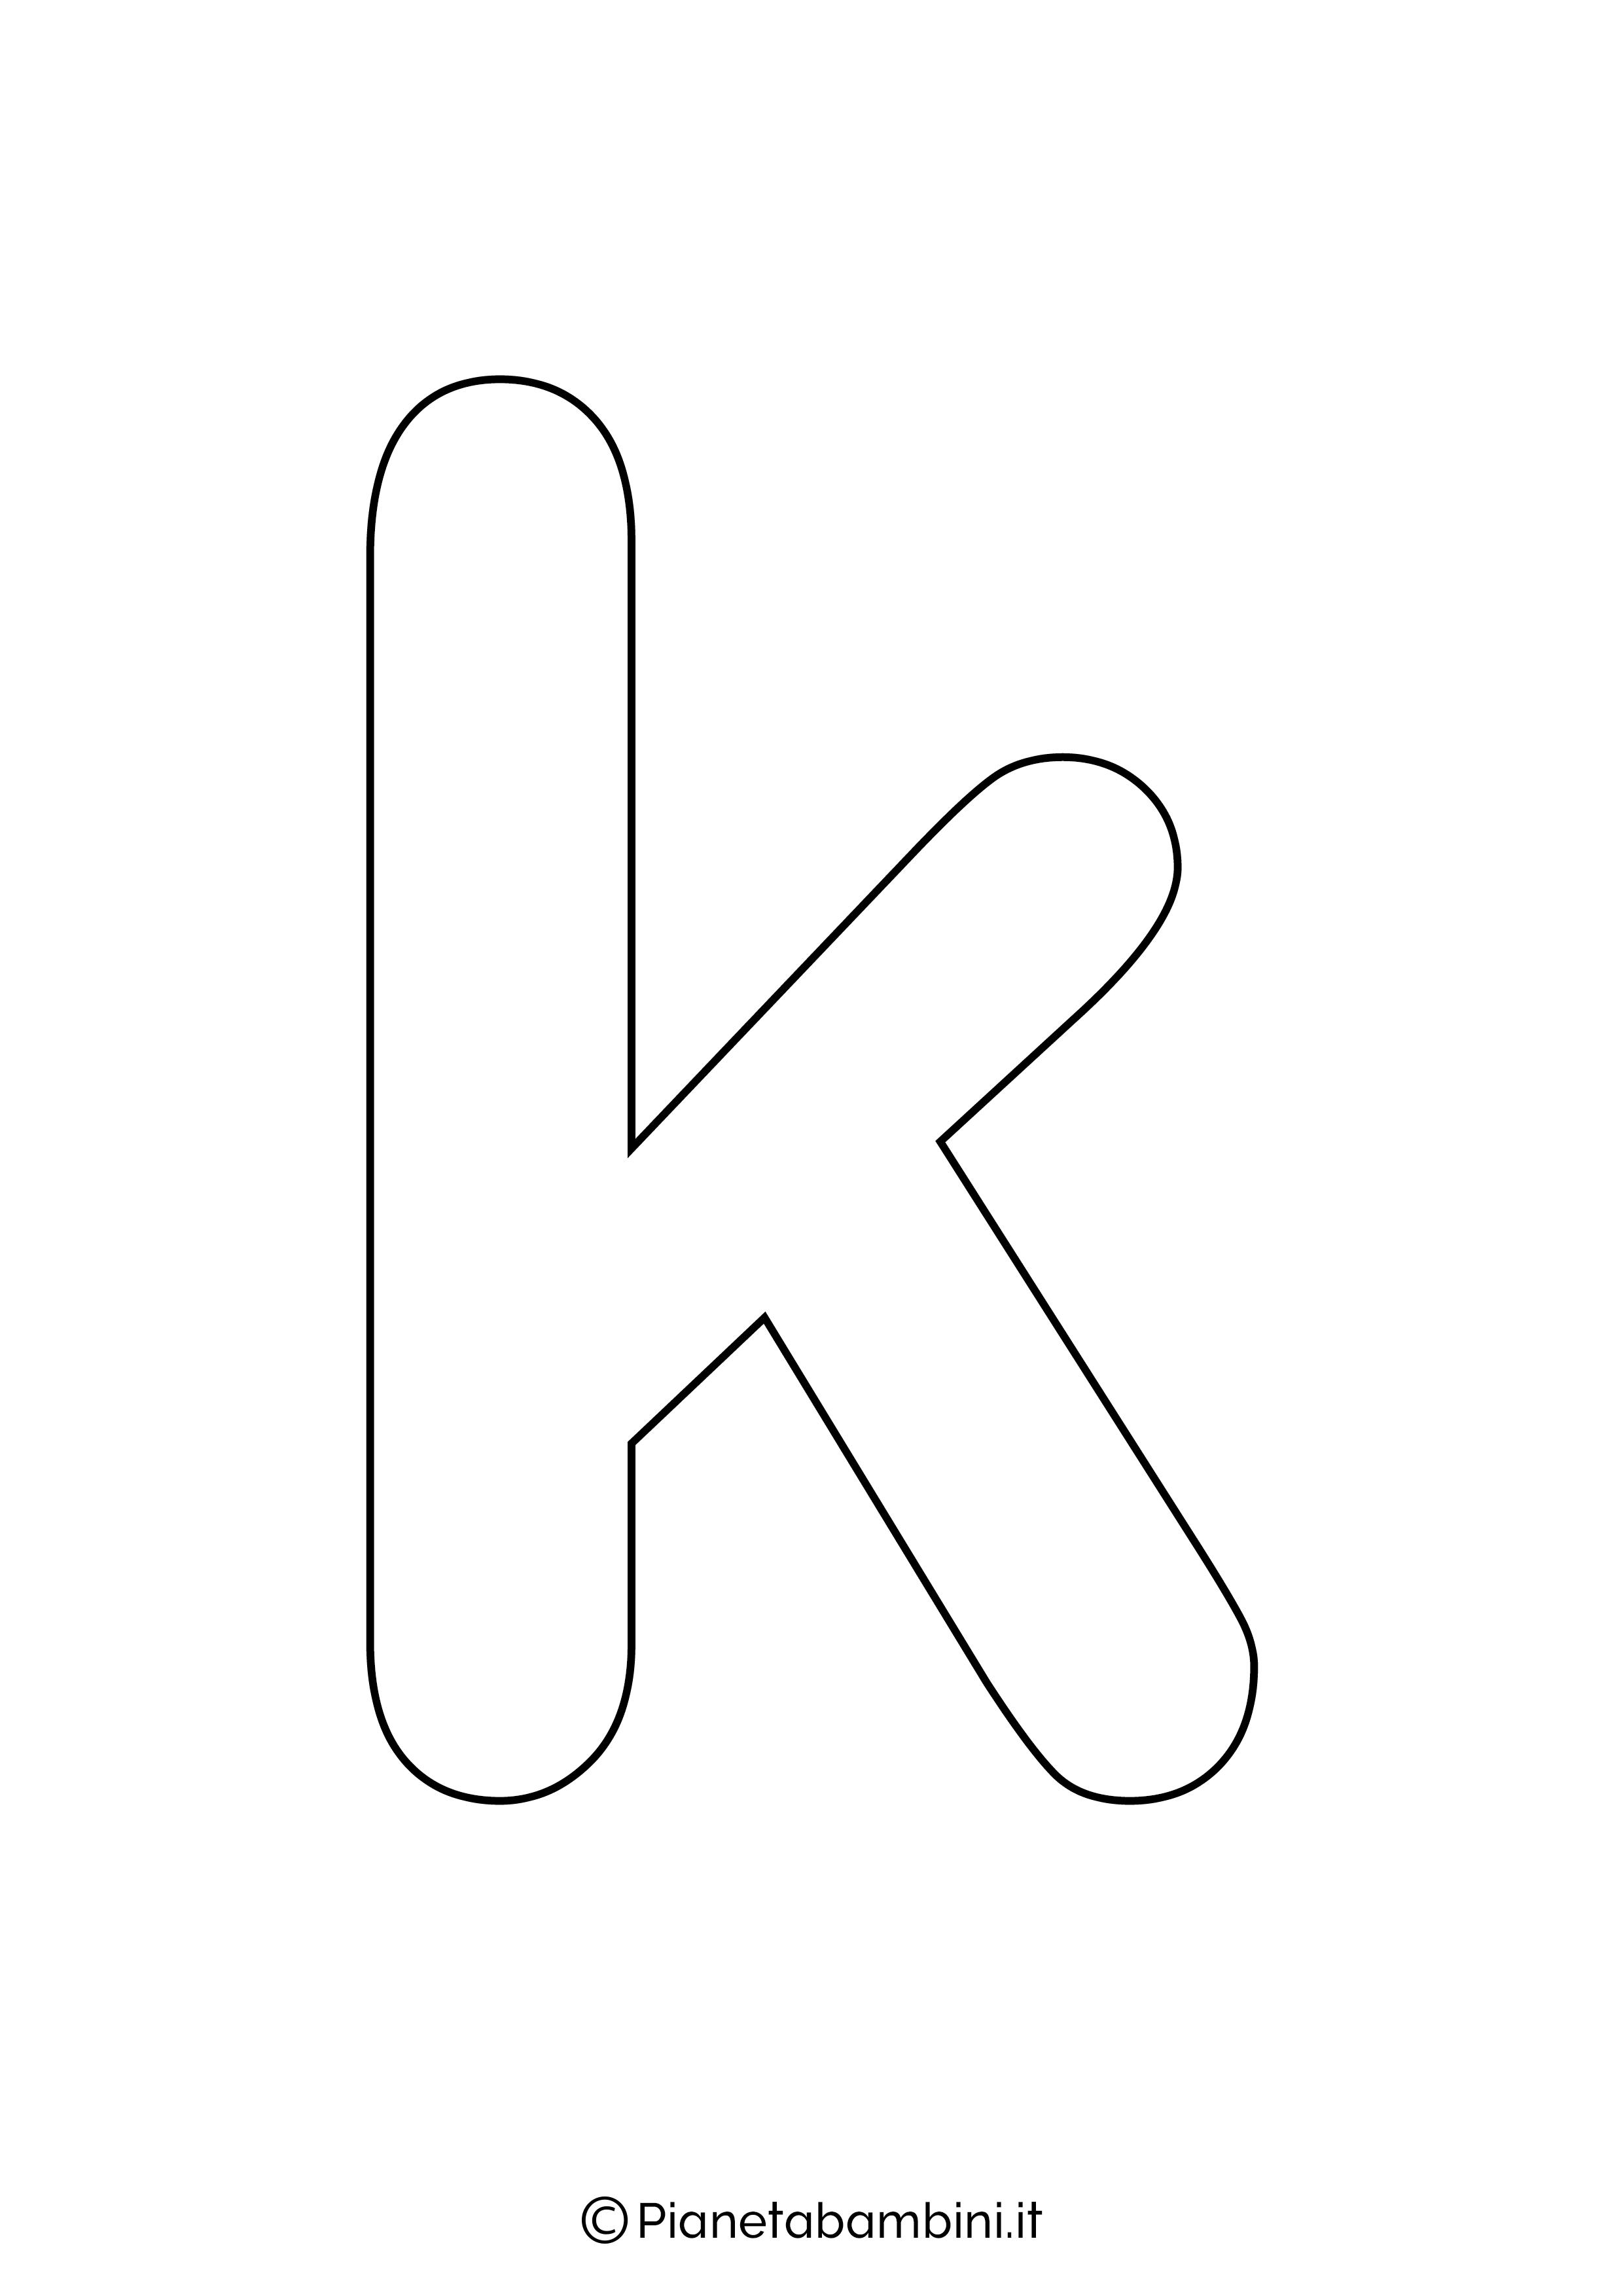 Lettera K minuscola da stampare